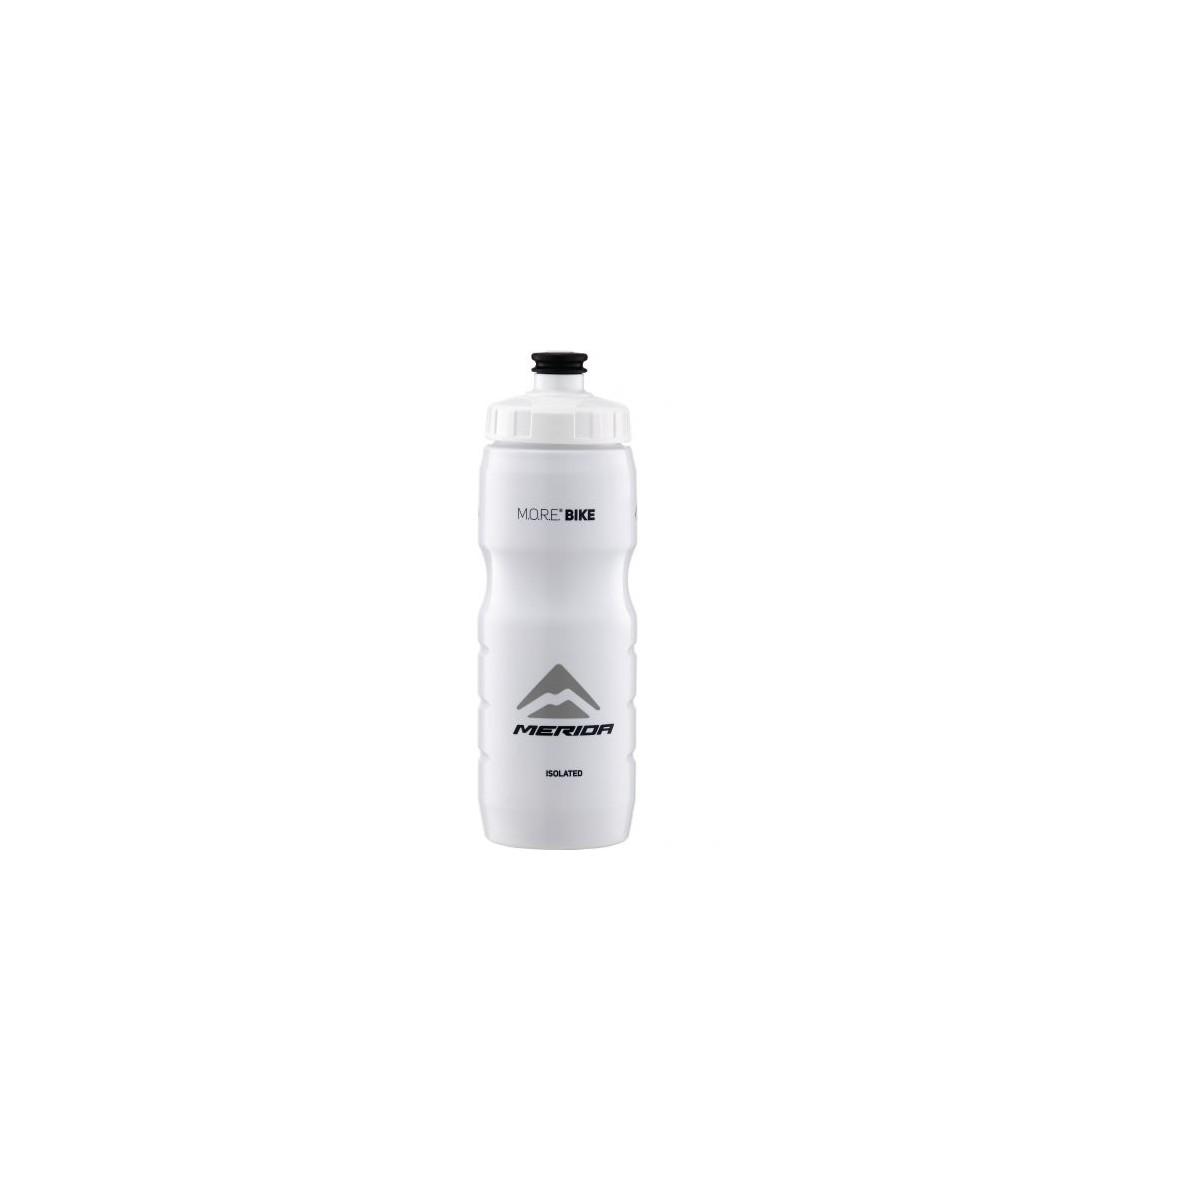 Velo pudeles Merida 650CC Thermos bottle